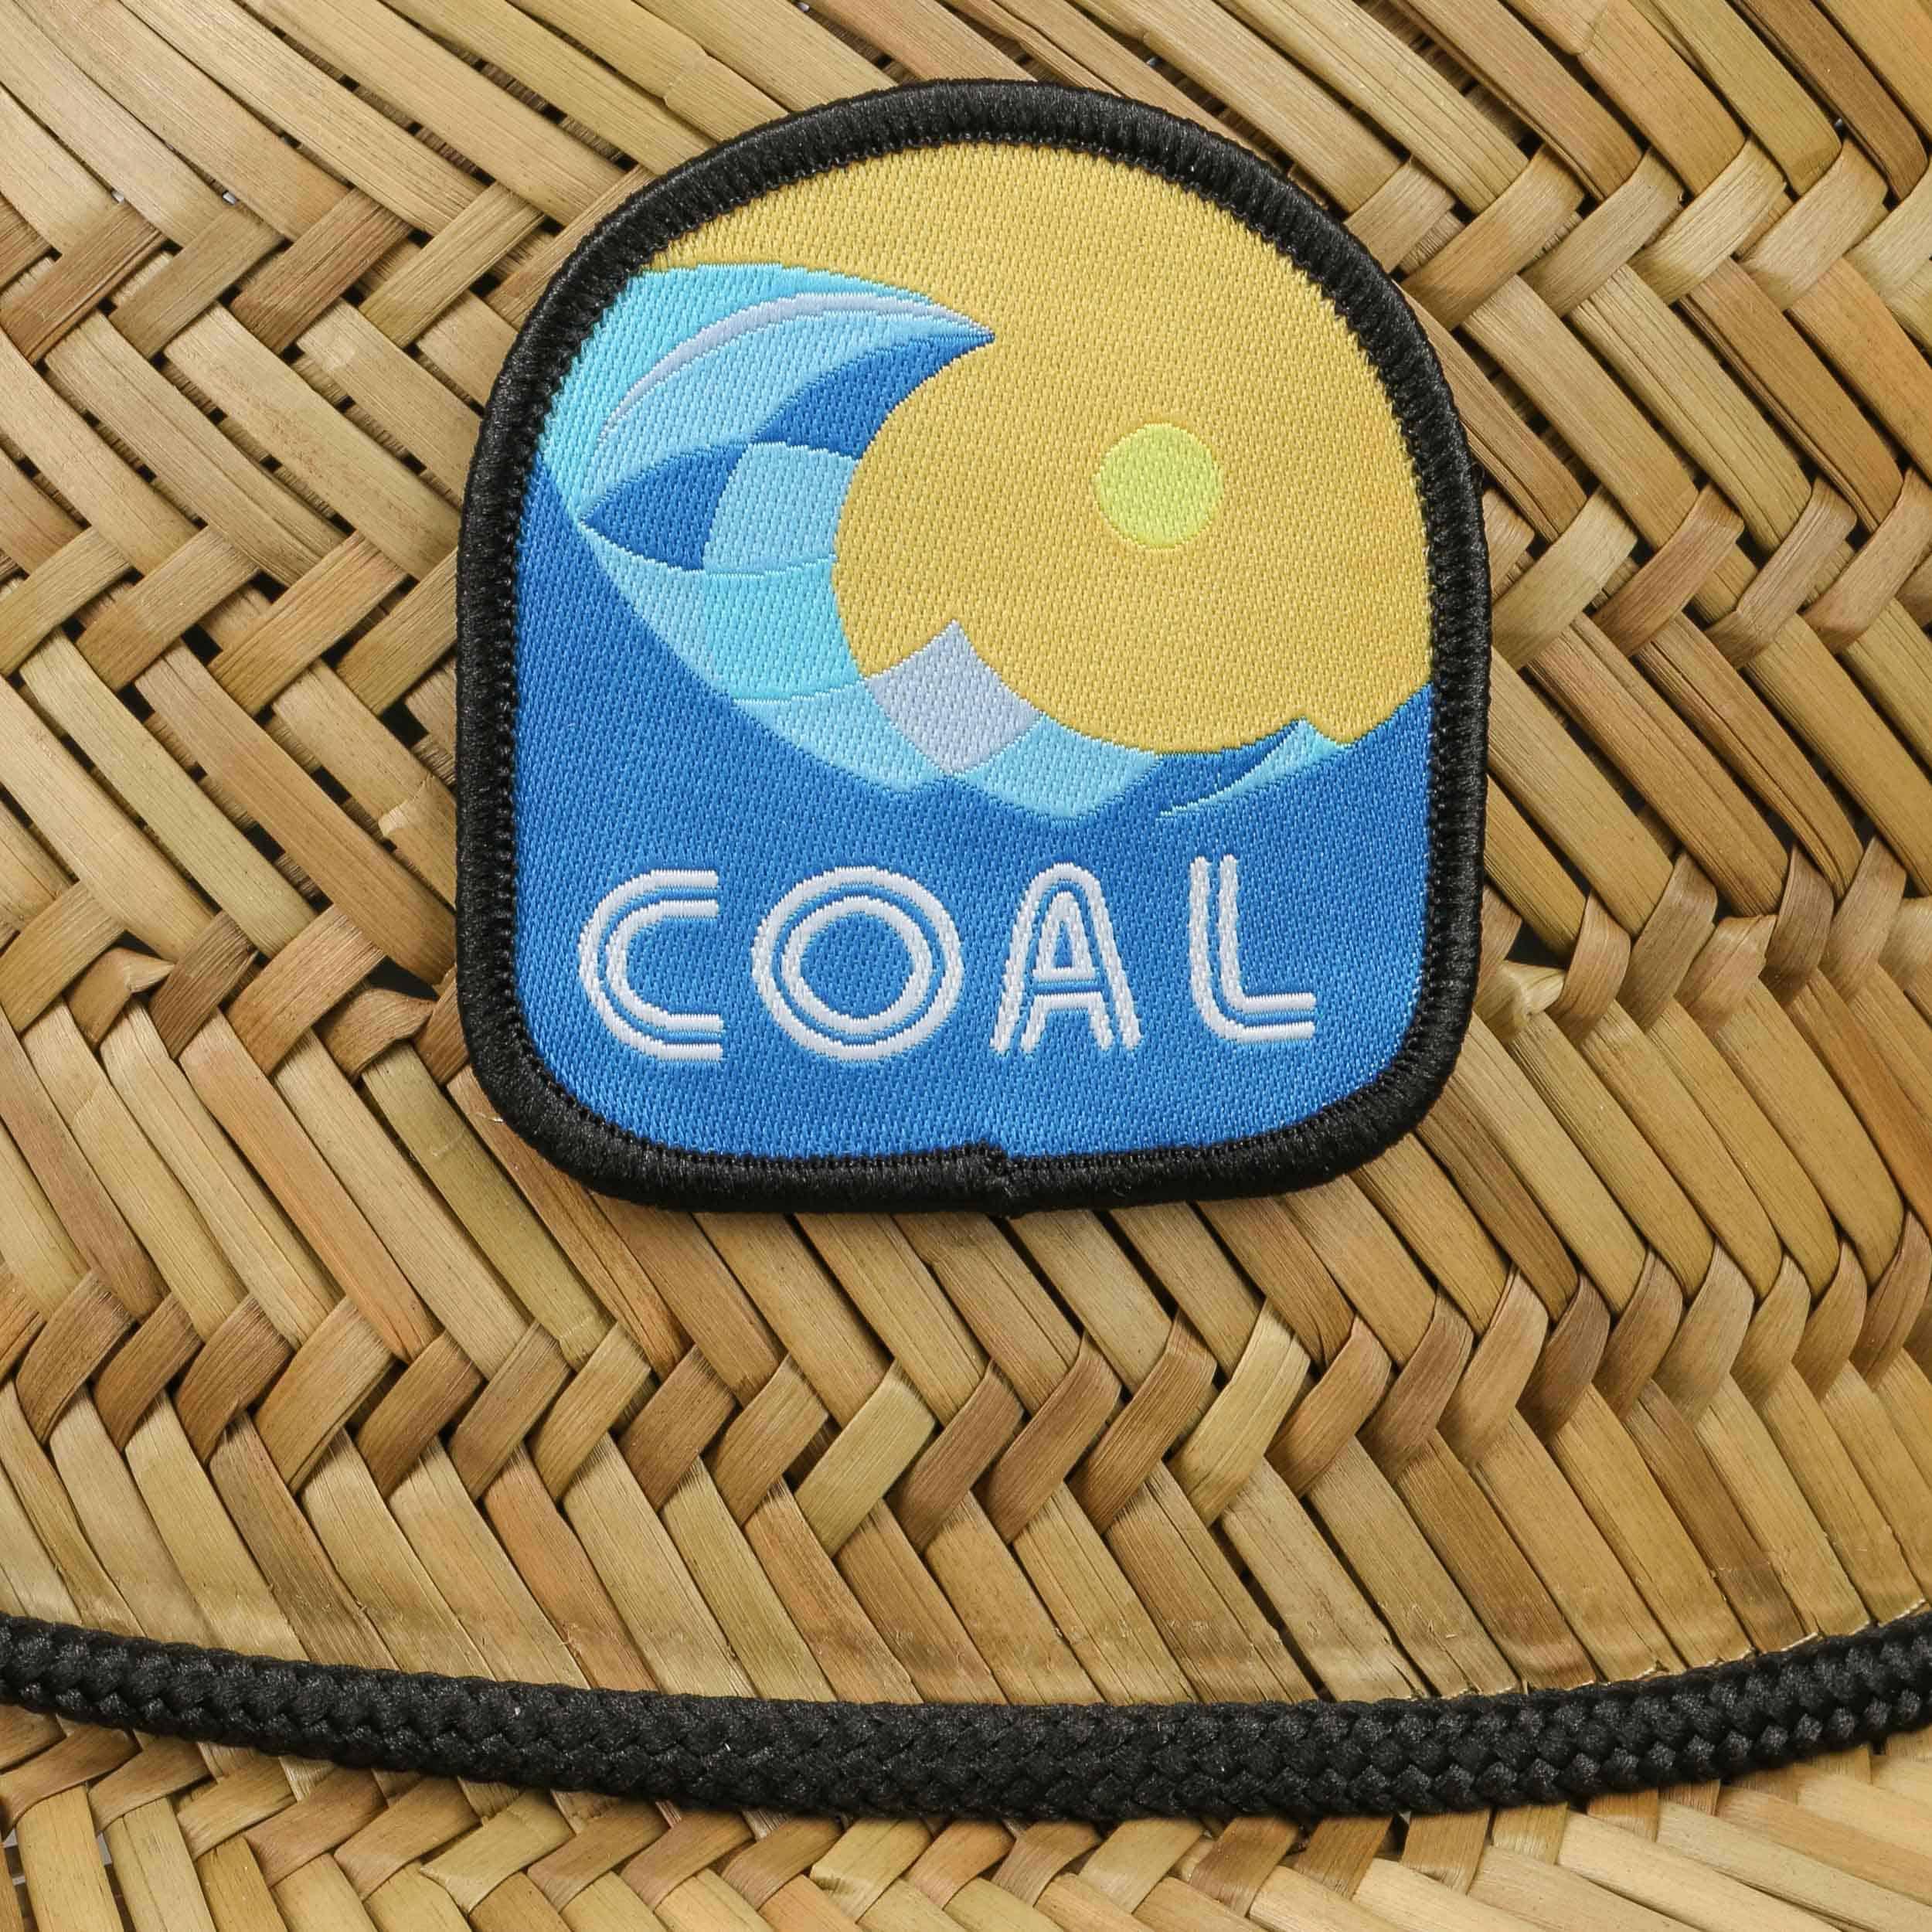 be99055b22b ... Sombrero de Paja The Huck Lifeguard by Coal - natural 3 ...